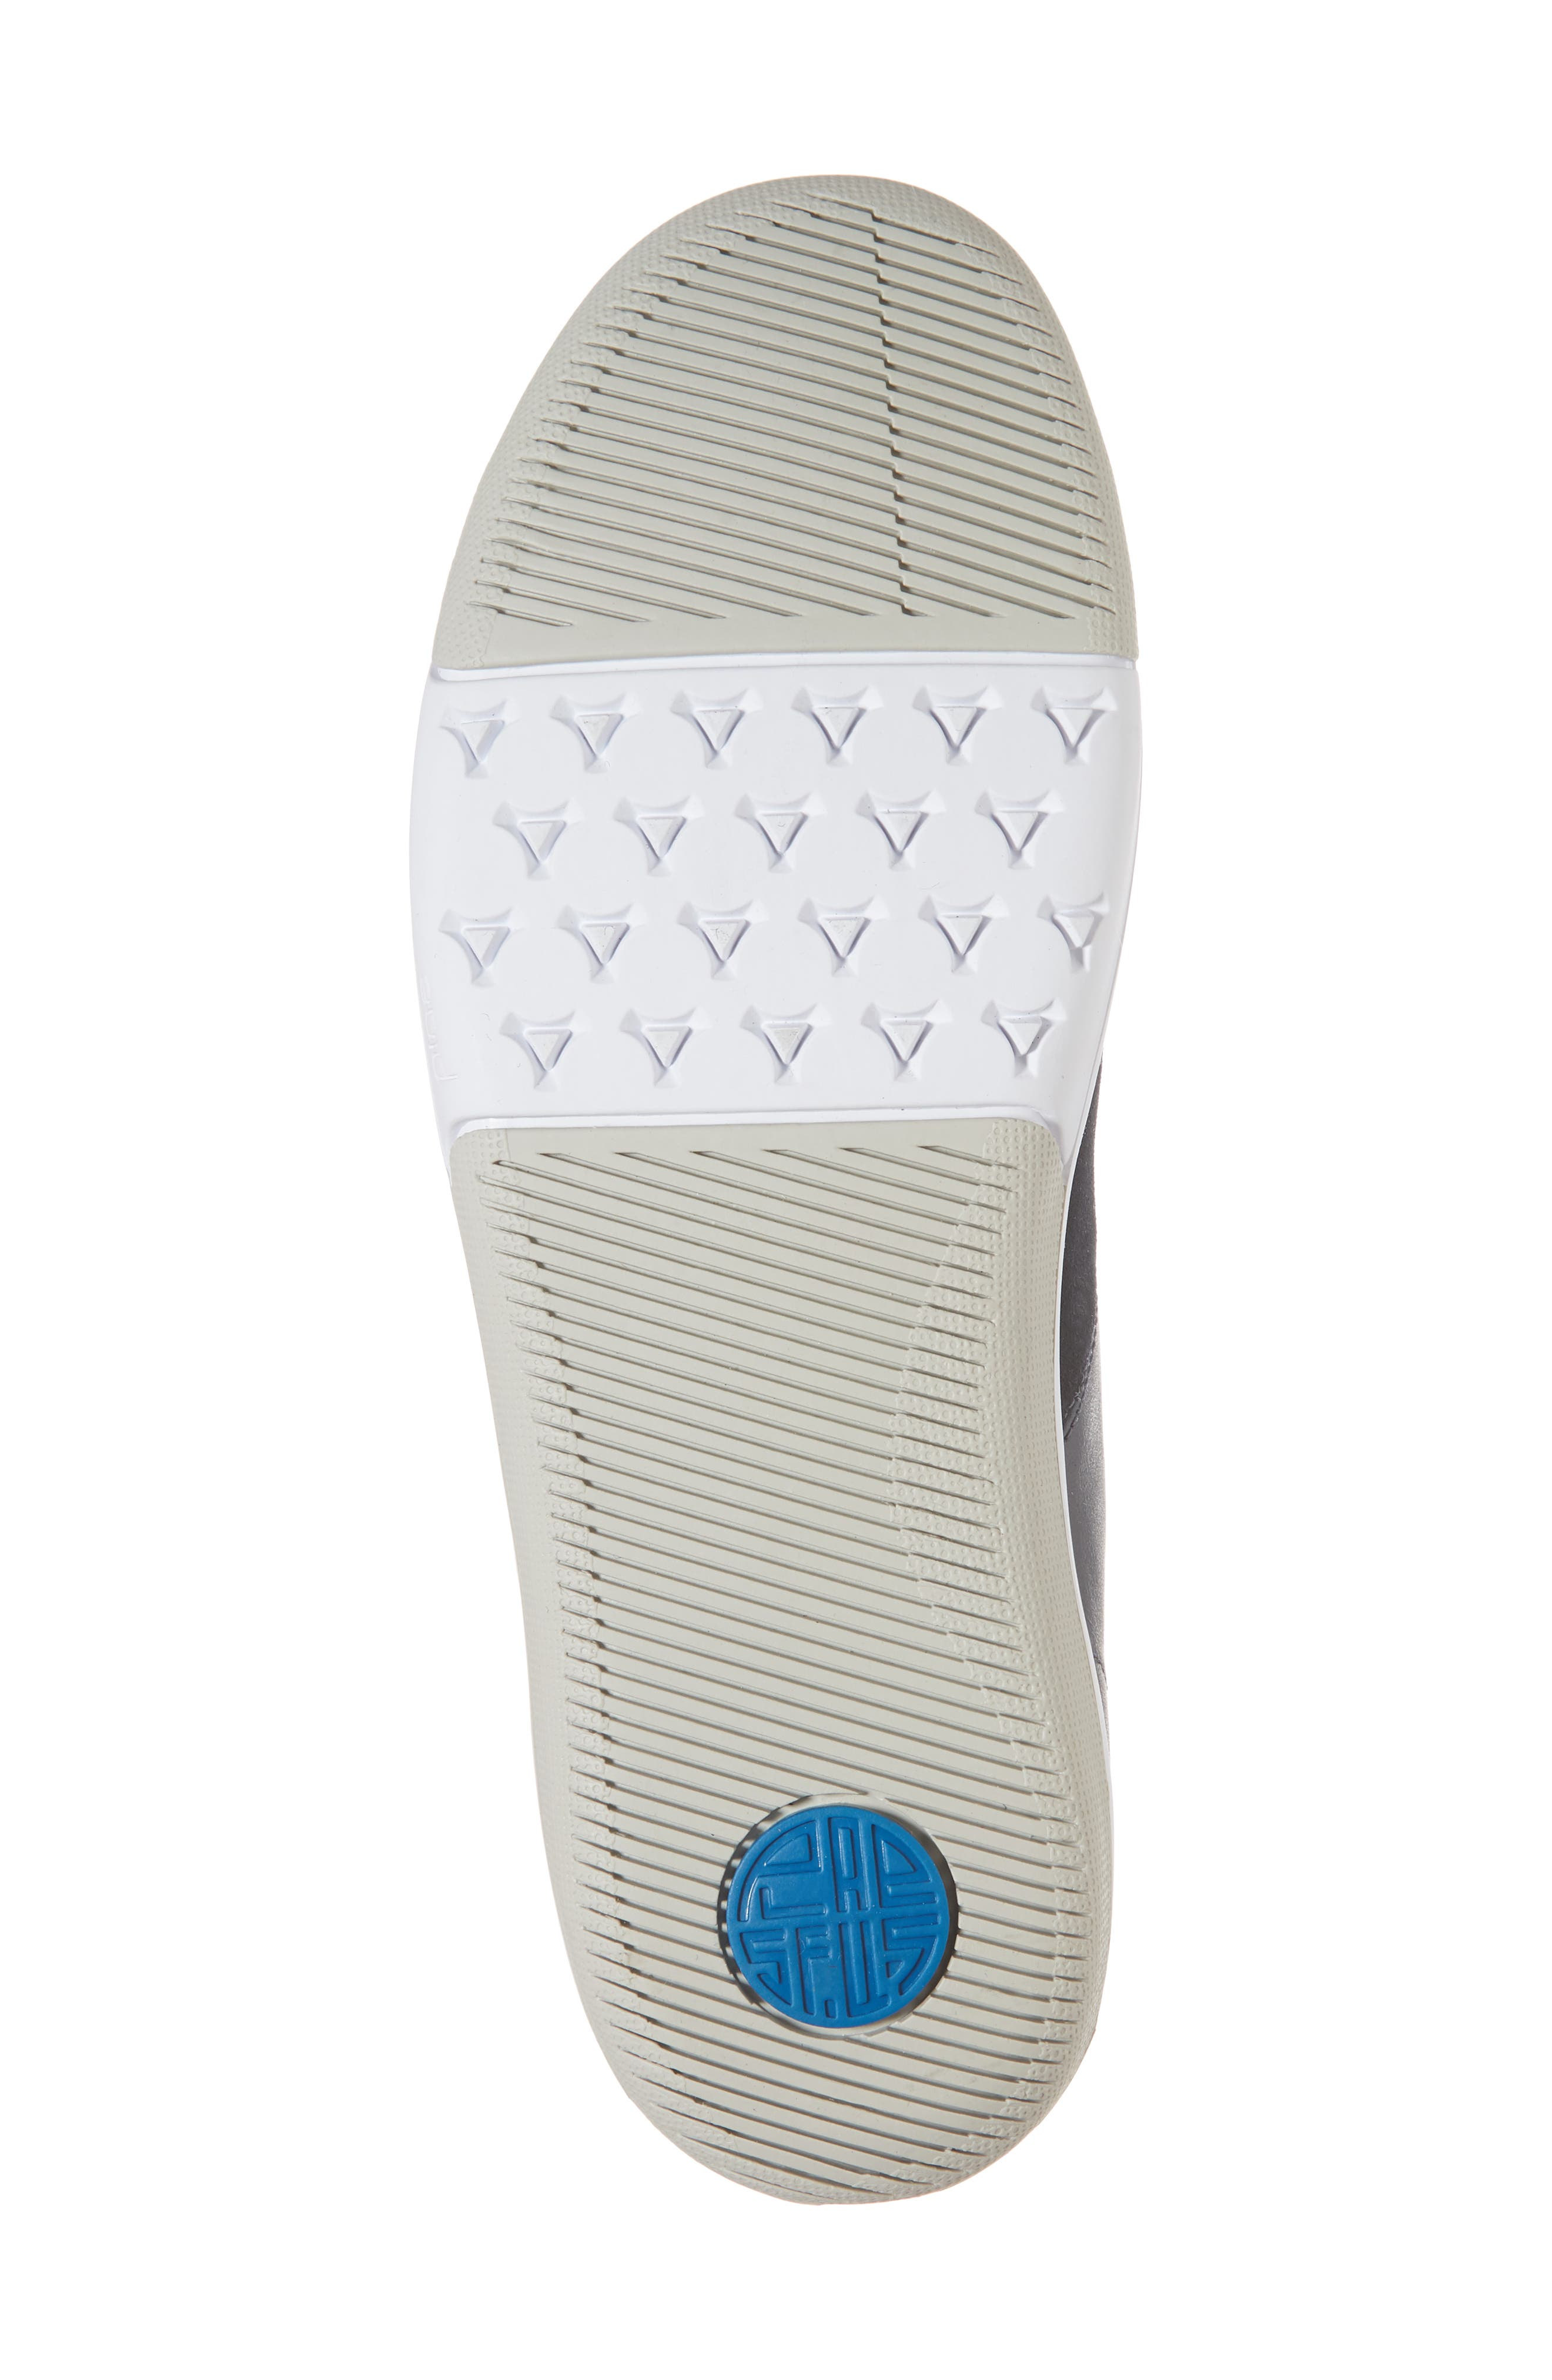 Larkin Low Top Sneaker,                             Alternate thumbnail 6, color,                             Blue Nights